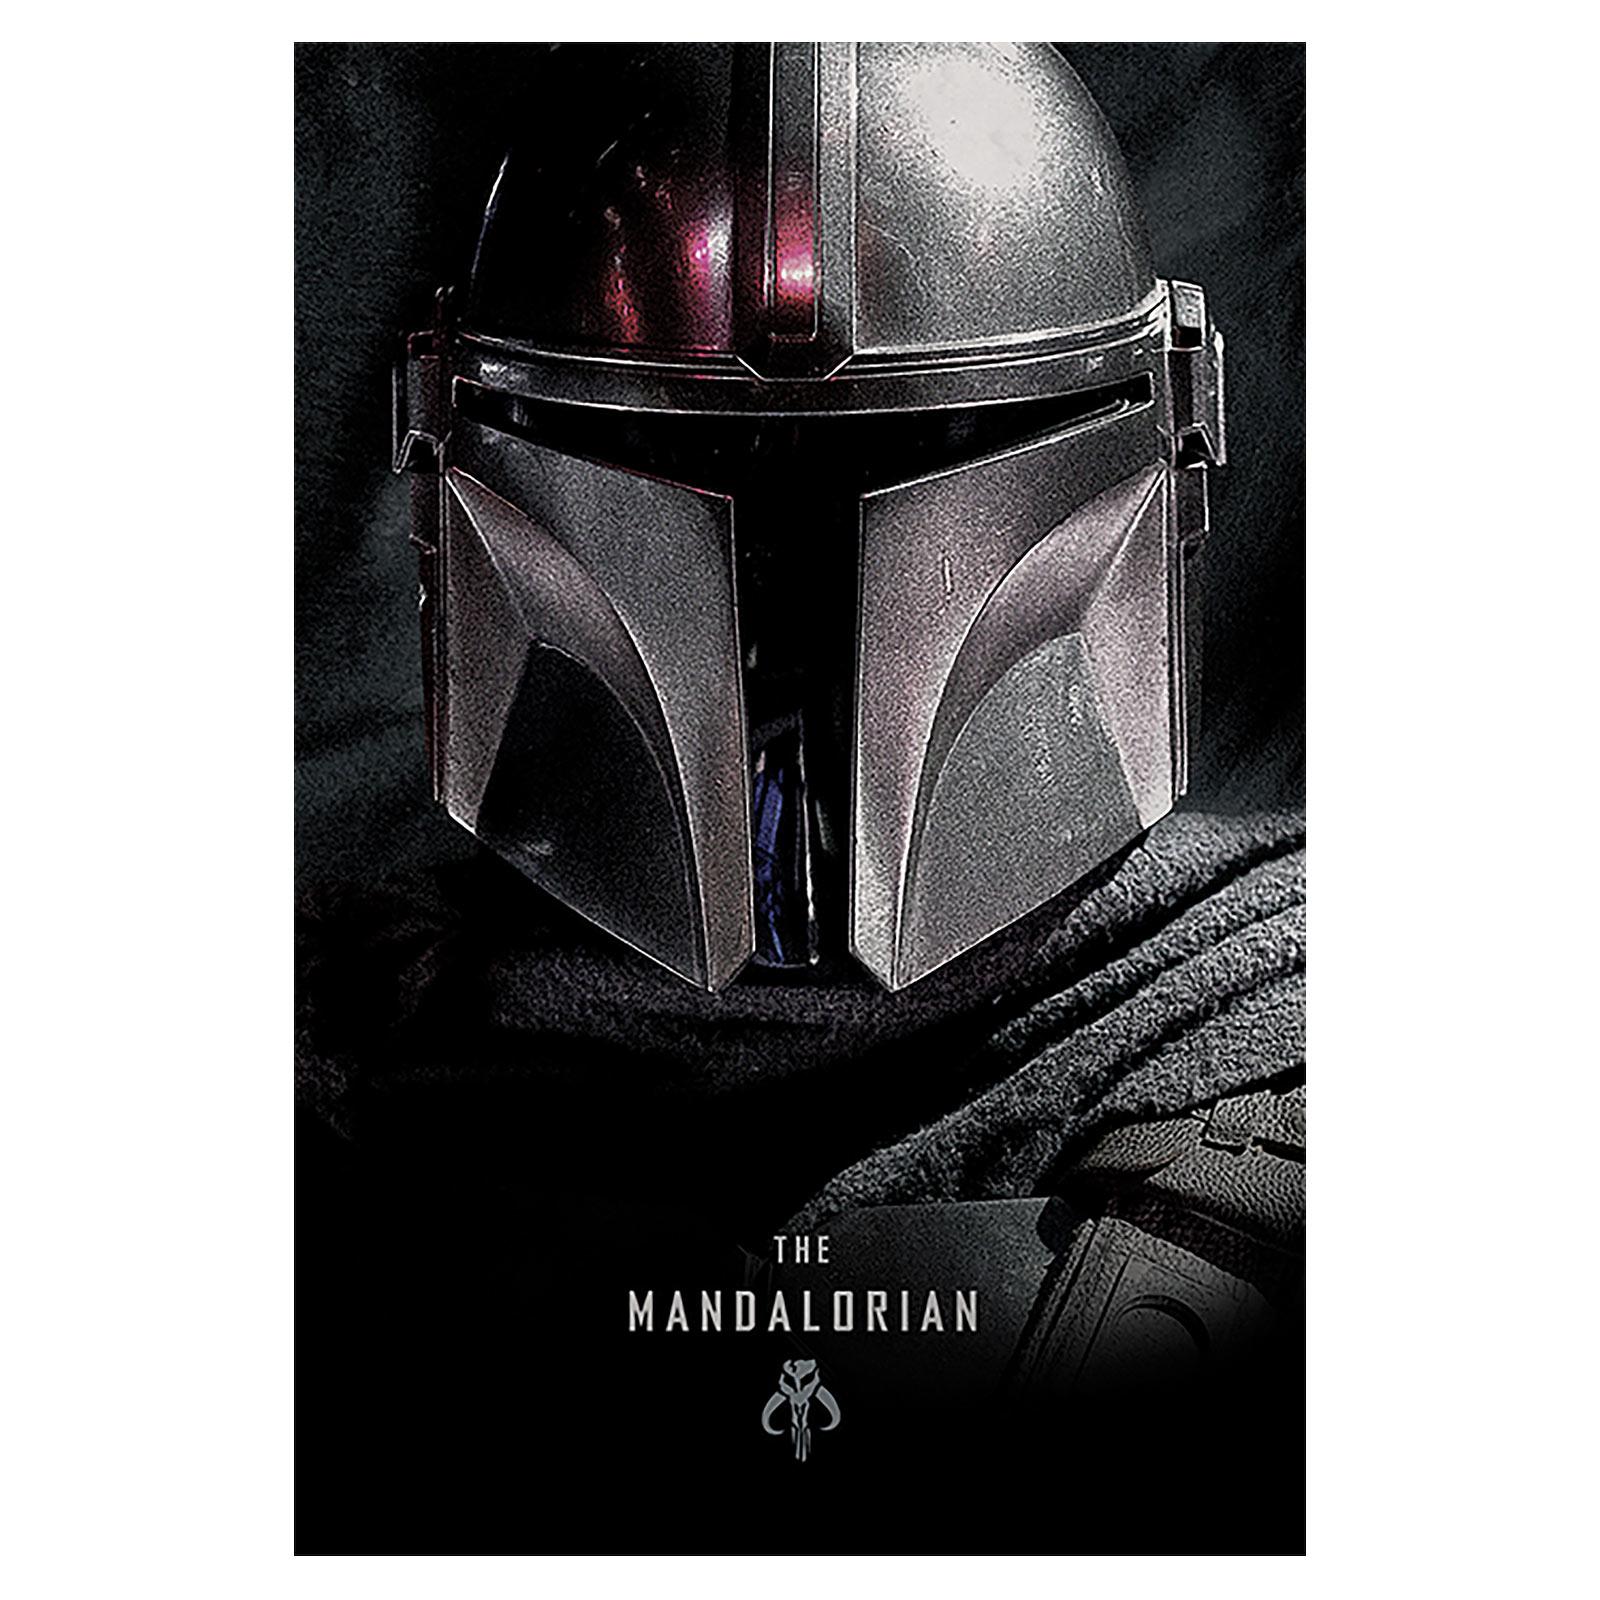 The Mandalorian Dark Maxi Poster - Star Wars